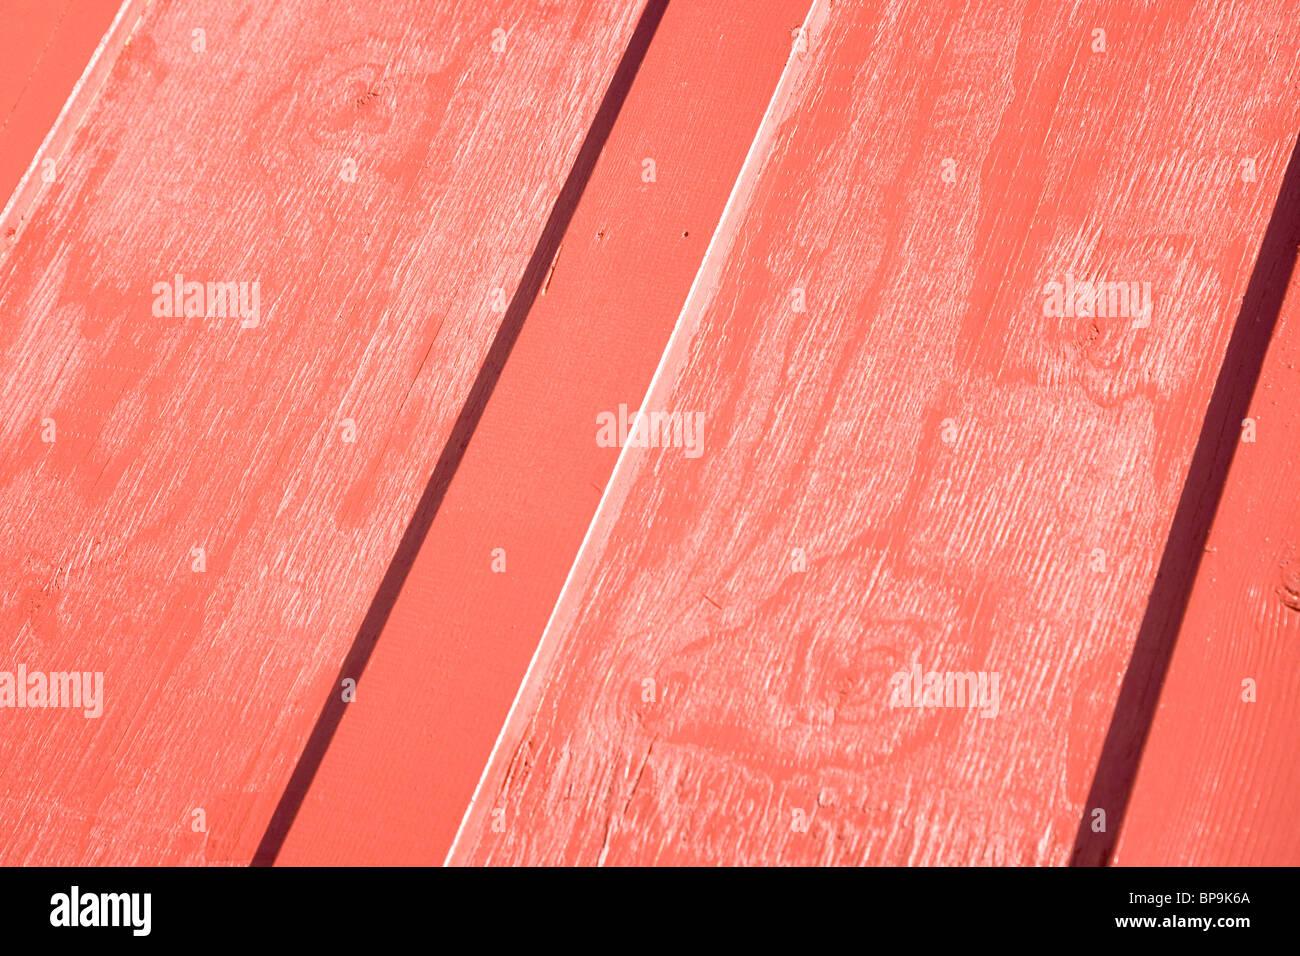 Patrón de madera roja cerrar Imagen De Stock